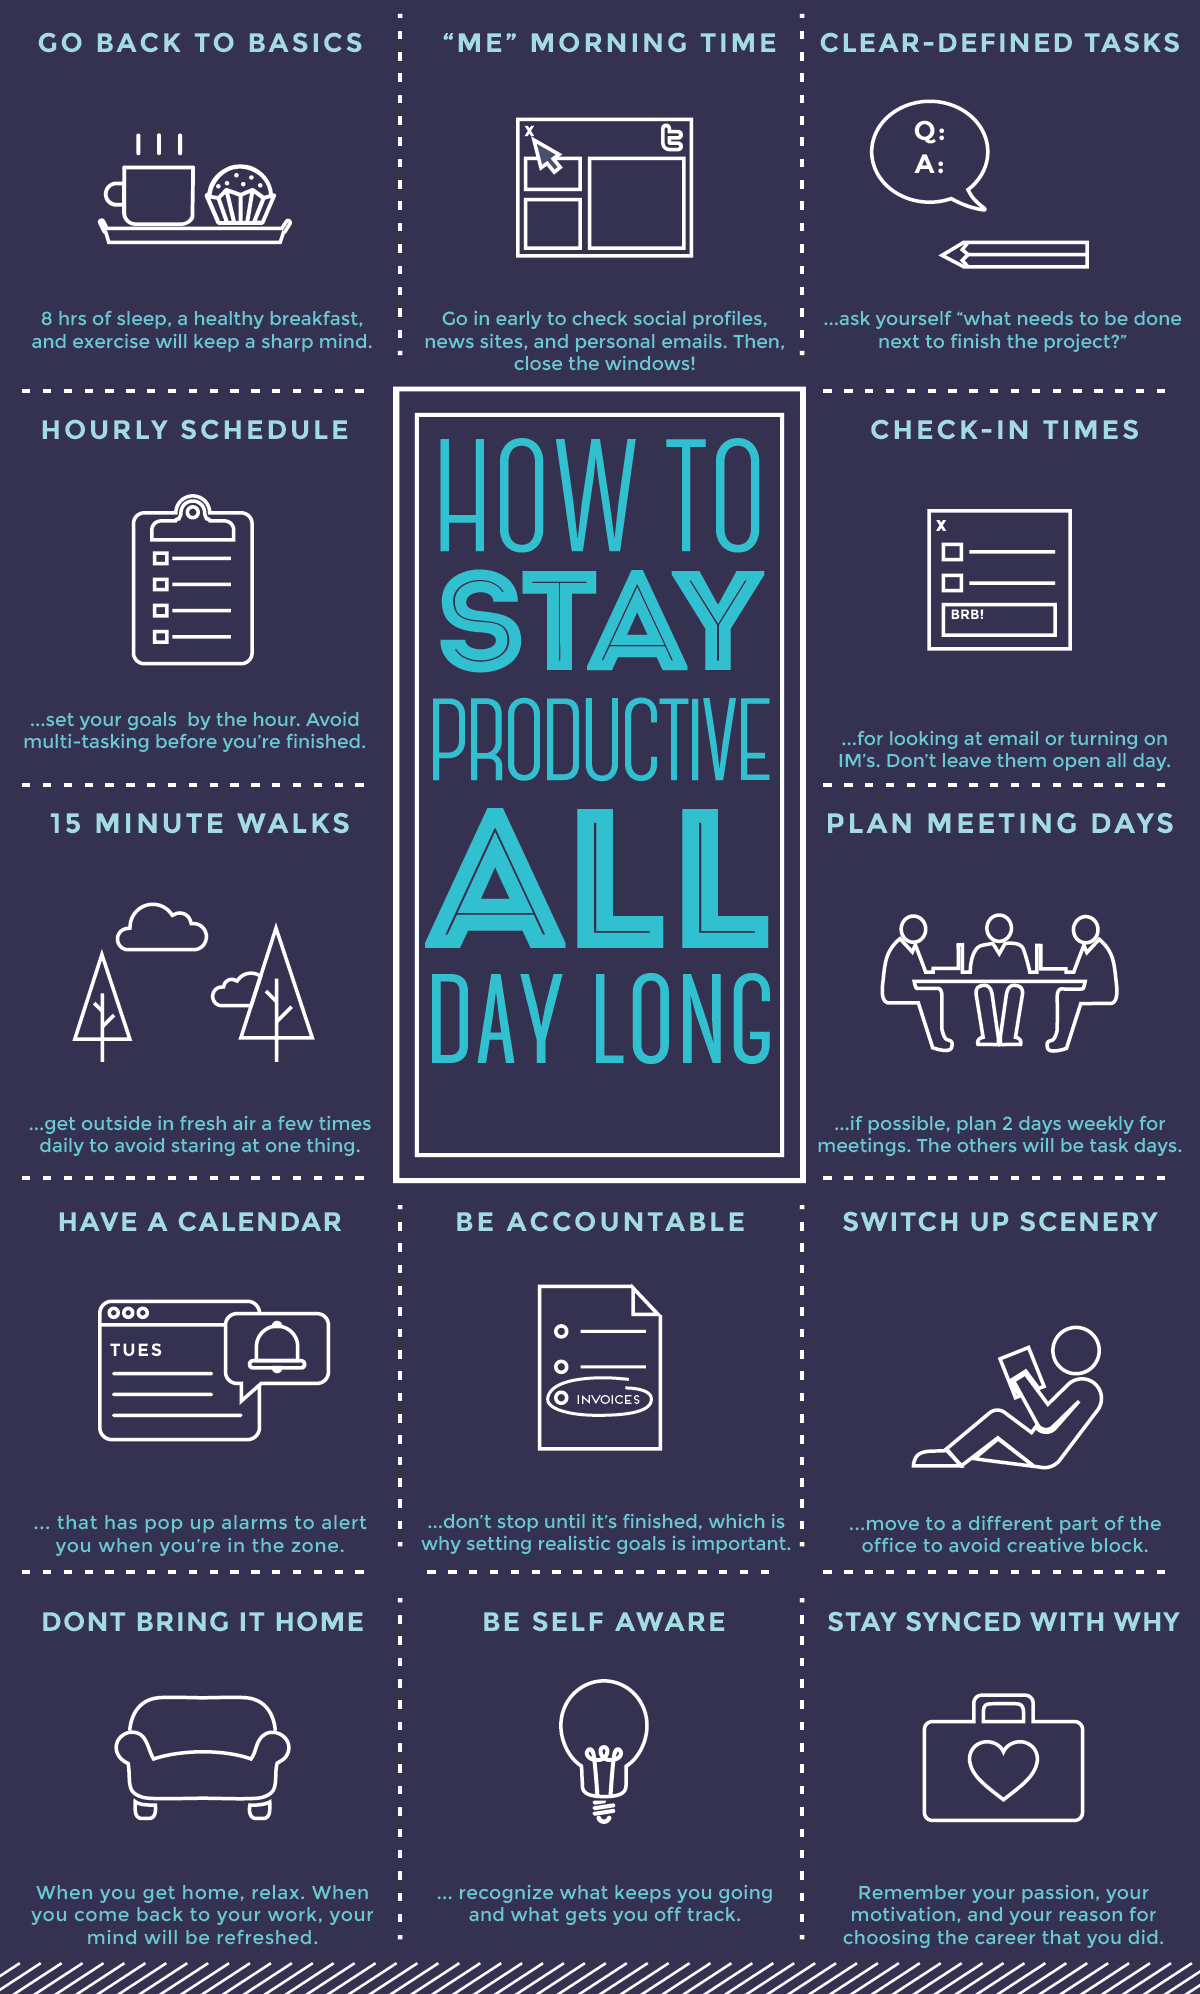 Productive Employee Tips Infographic Idea